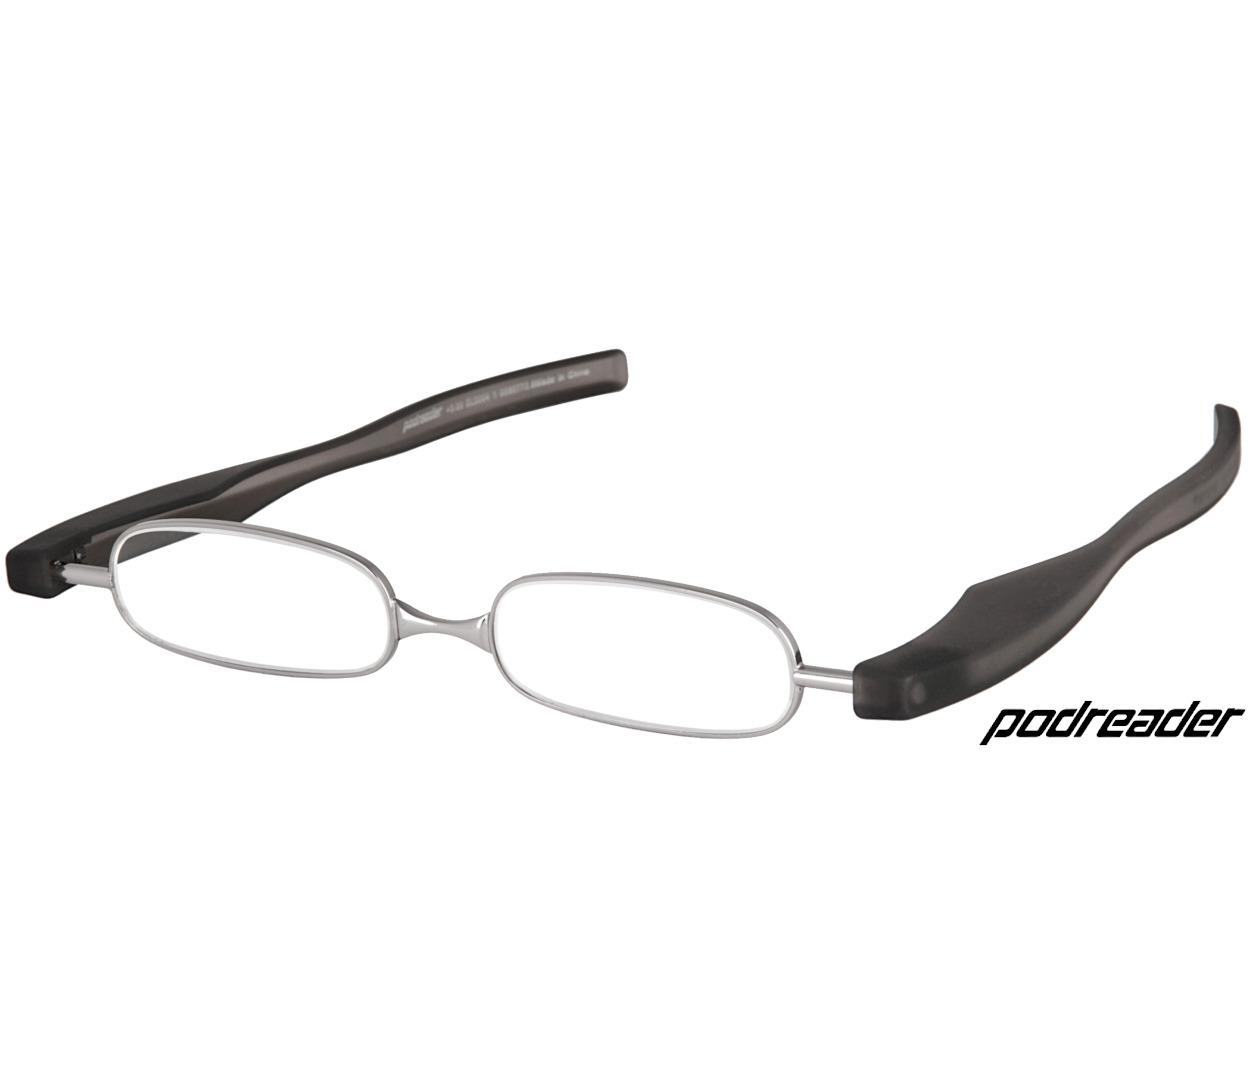 Main Image (Angle) - Podreader (Black) Folding Reading Glasses